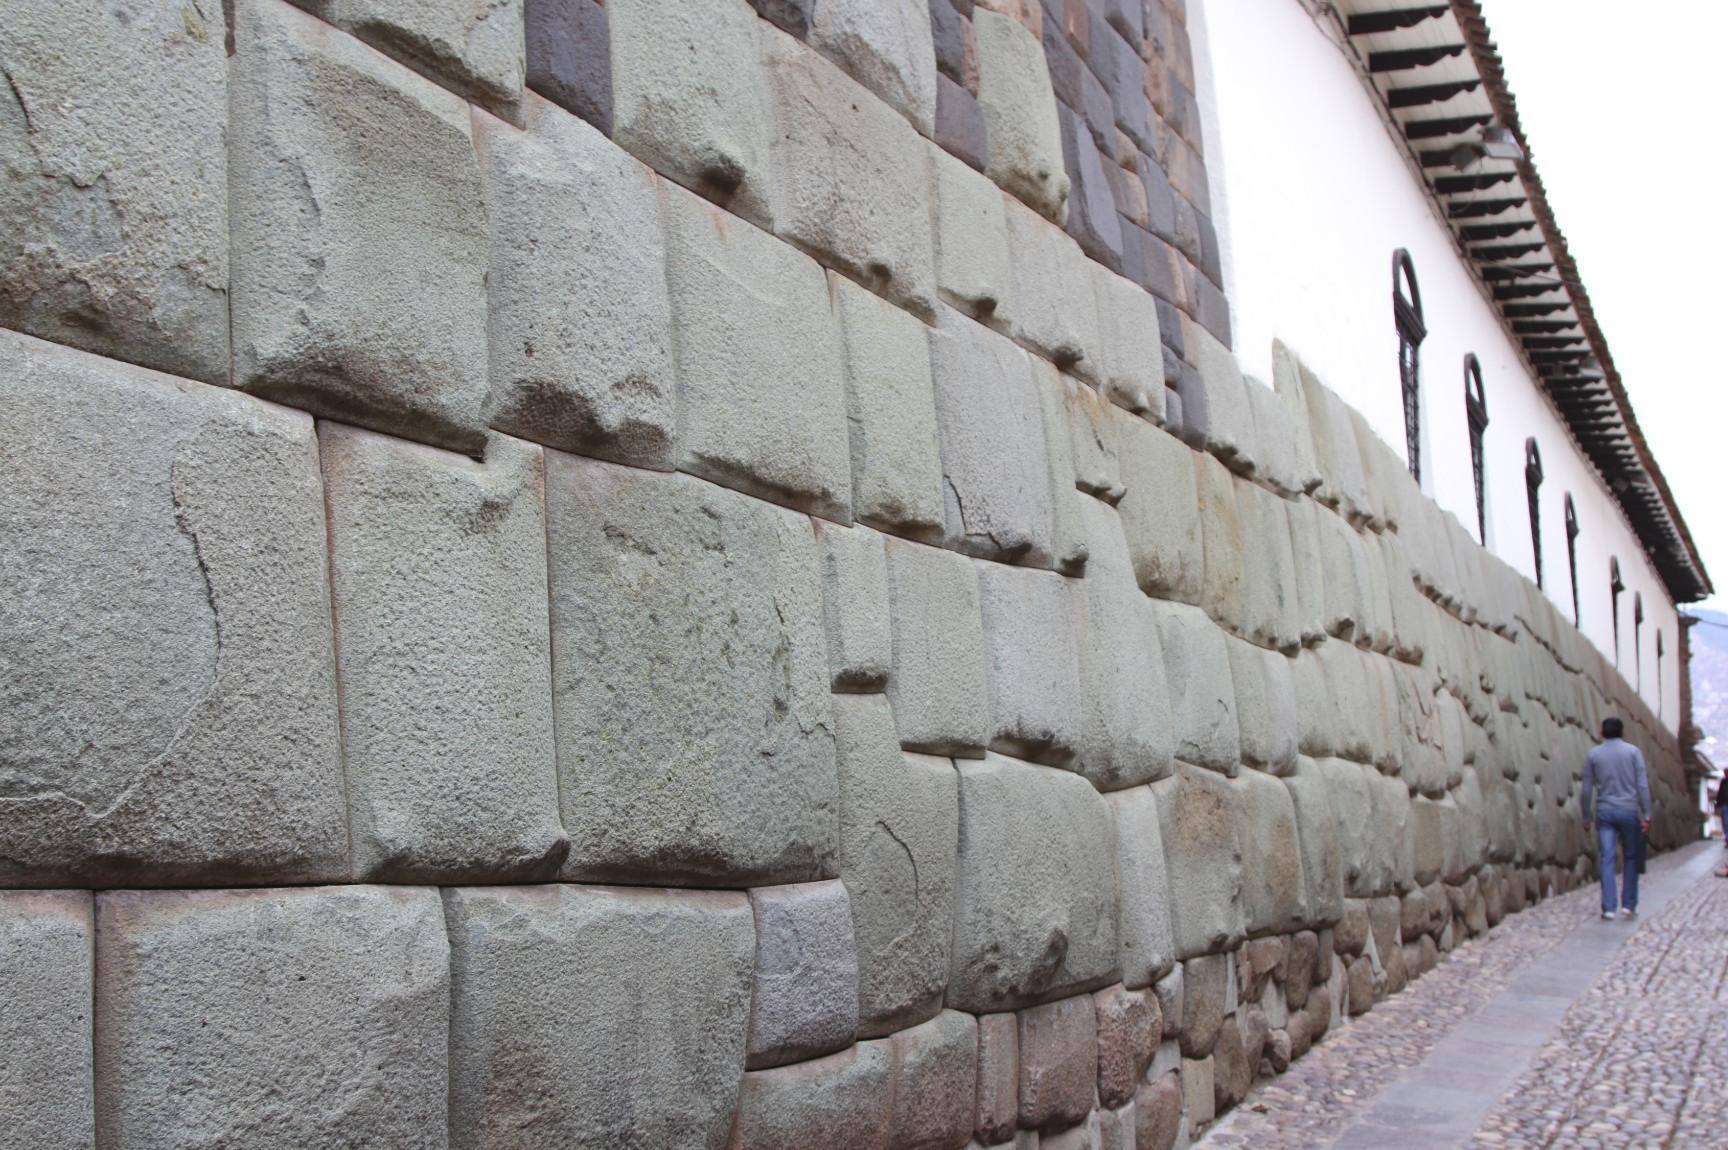 Inca Building Materials : Cusco ancient capital of the inca empire